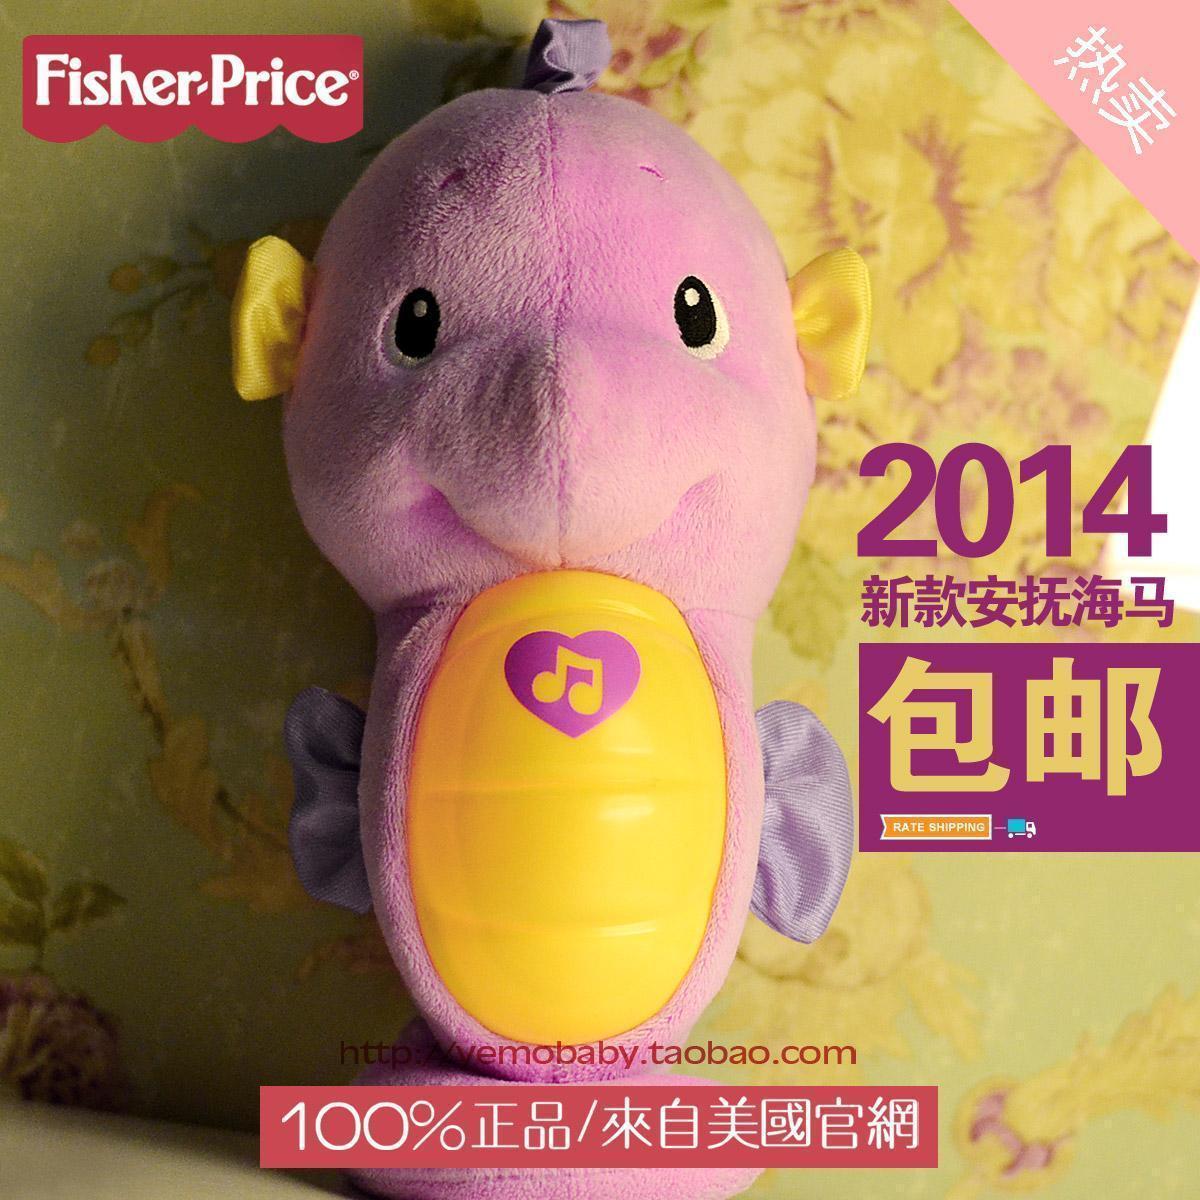 Мягкая детская игрушка Fisher/price  FISHER